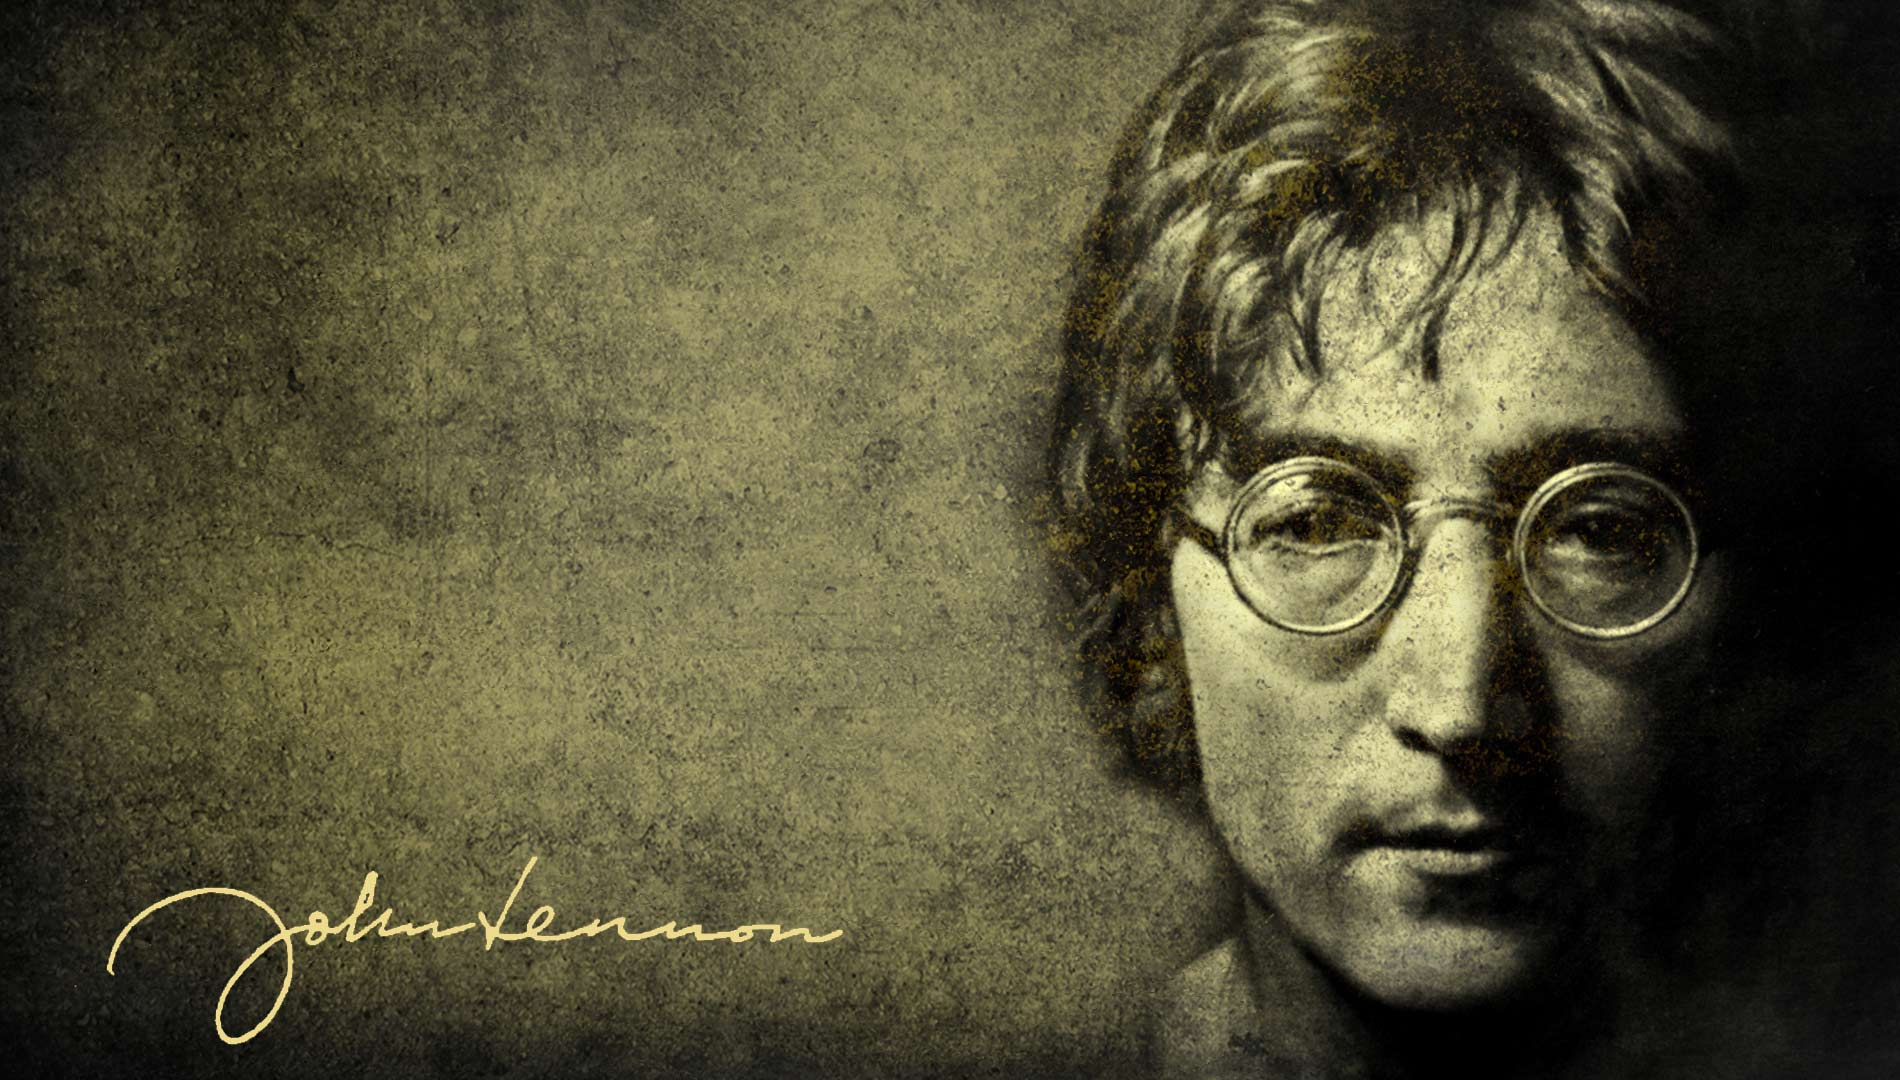 John Lennon Google Plus Cover